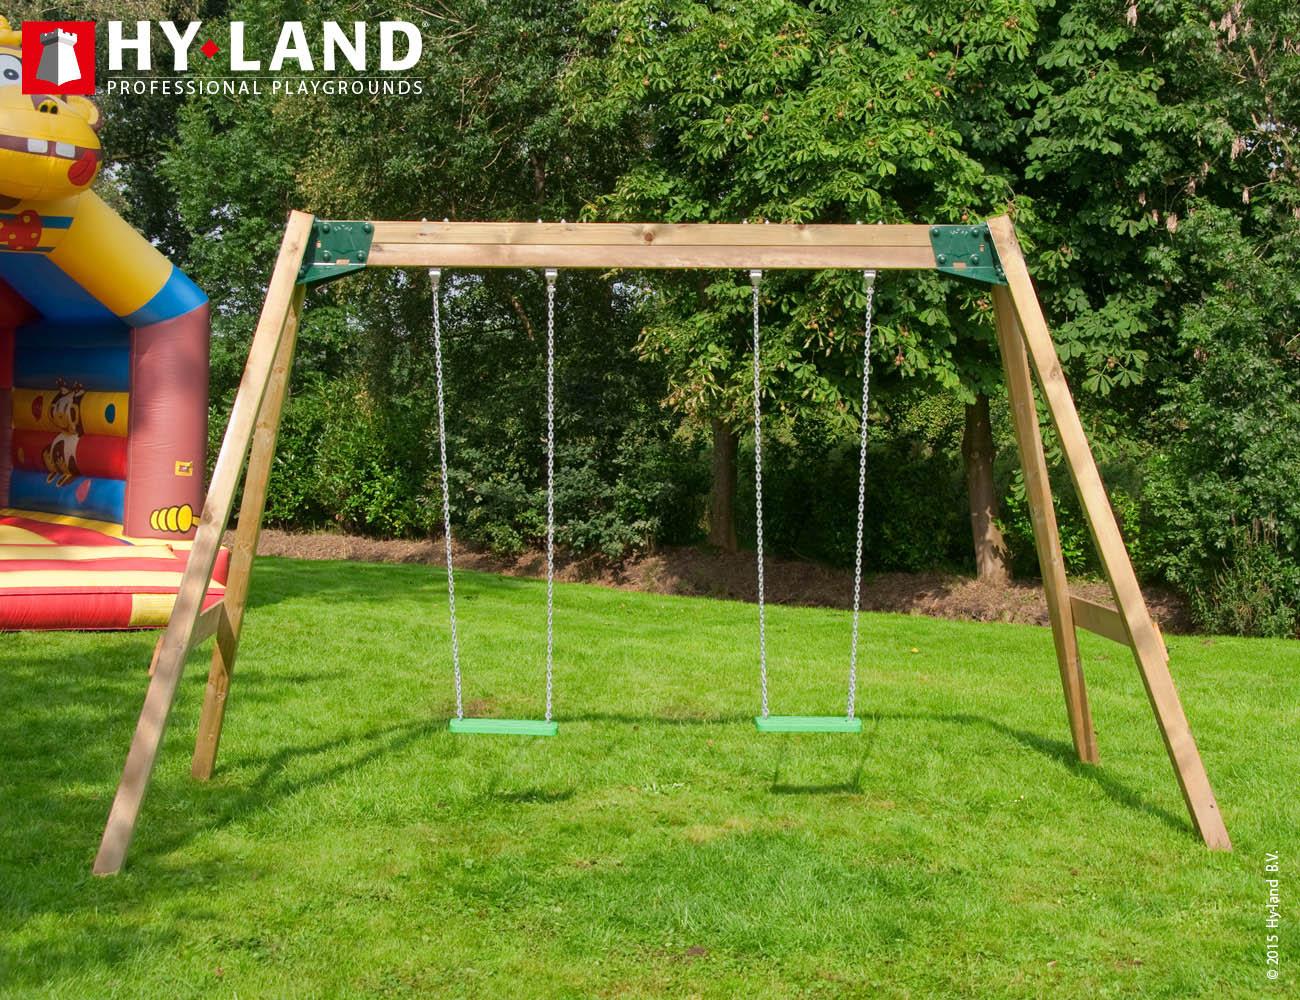 Hy-Land Classic Swing Set – Bild 3